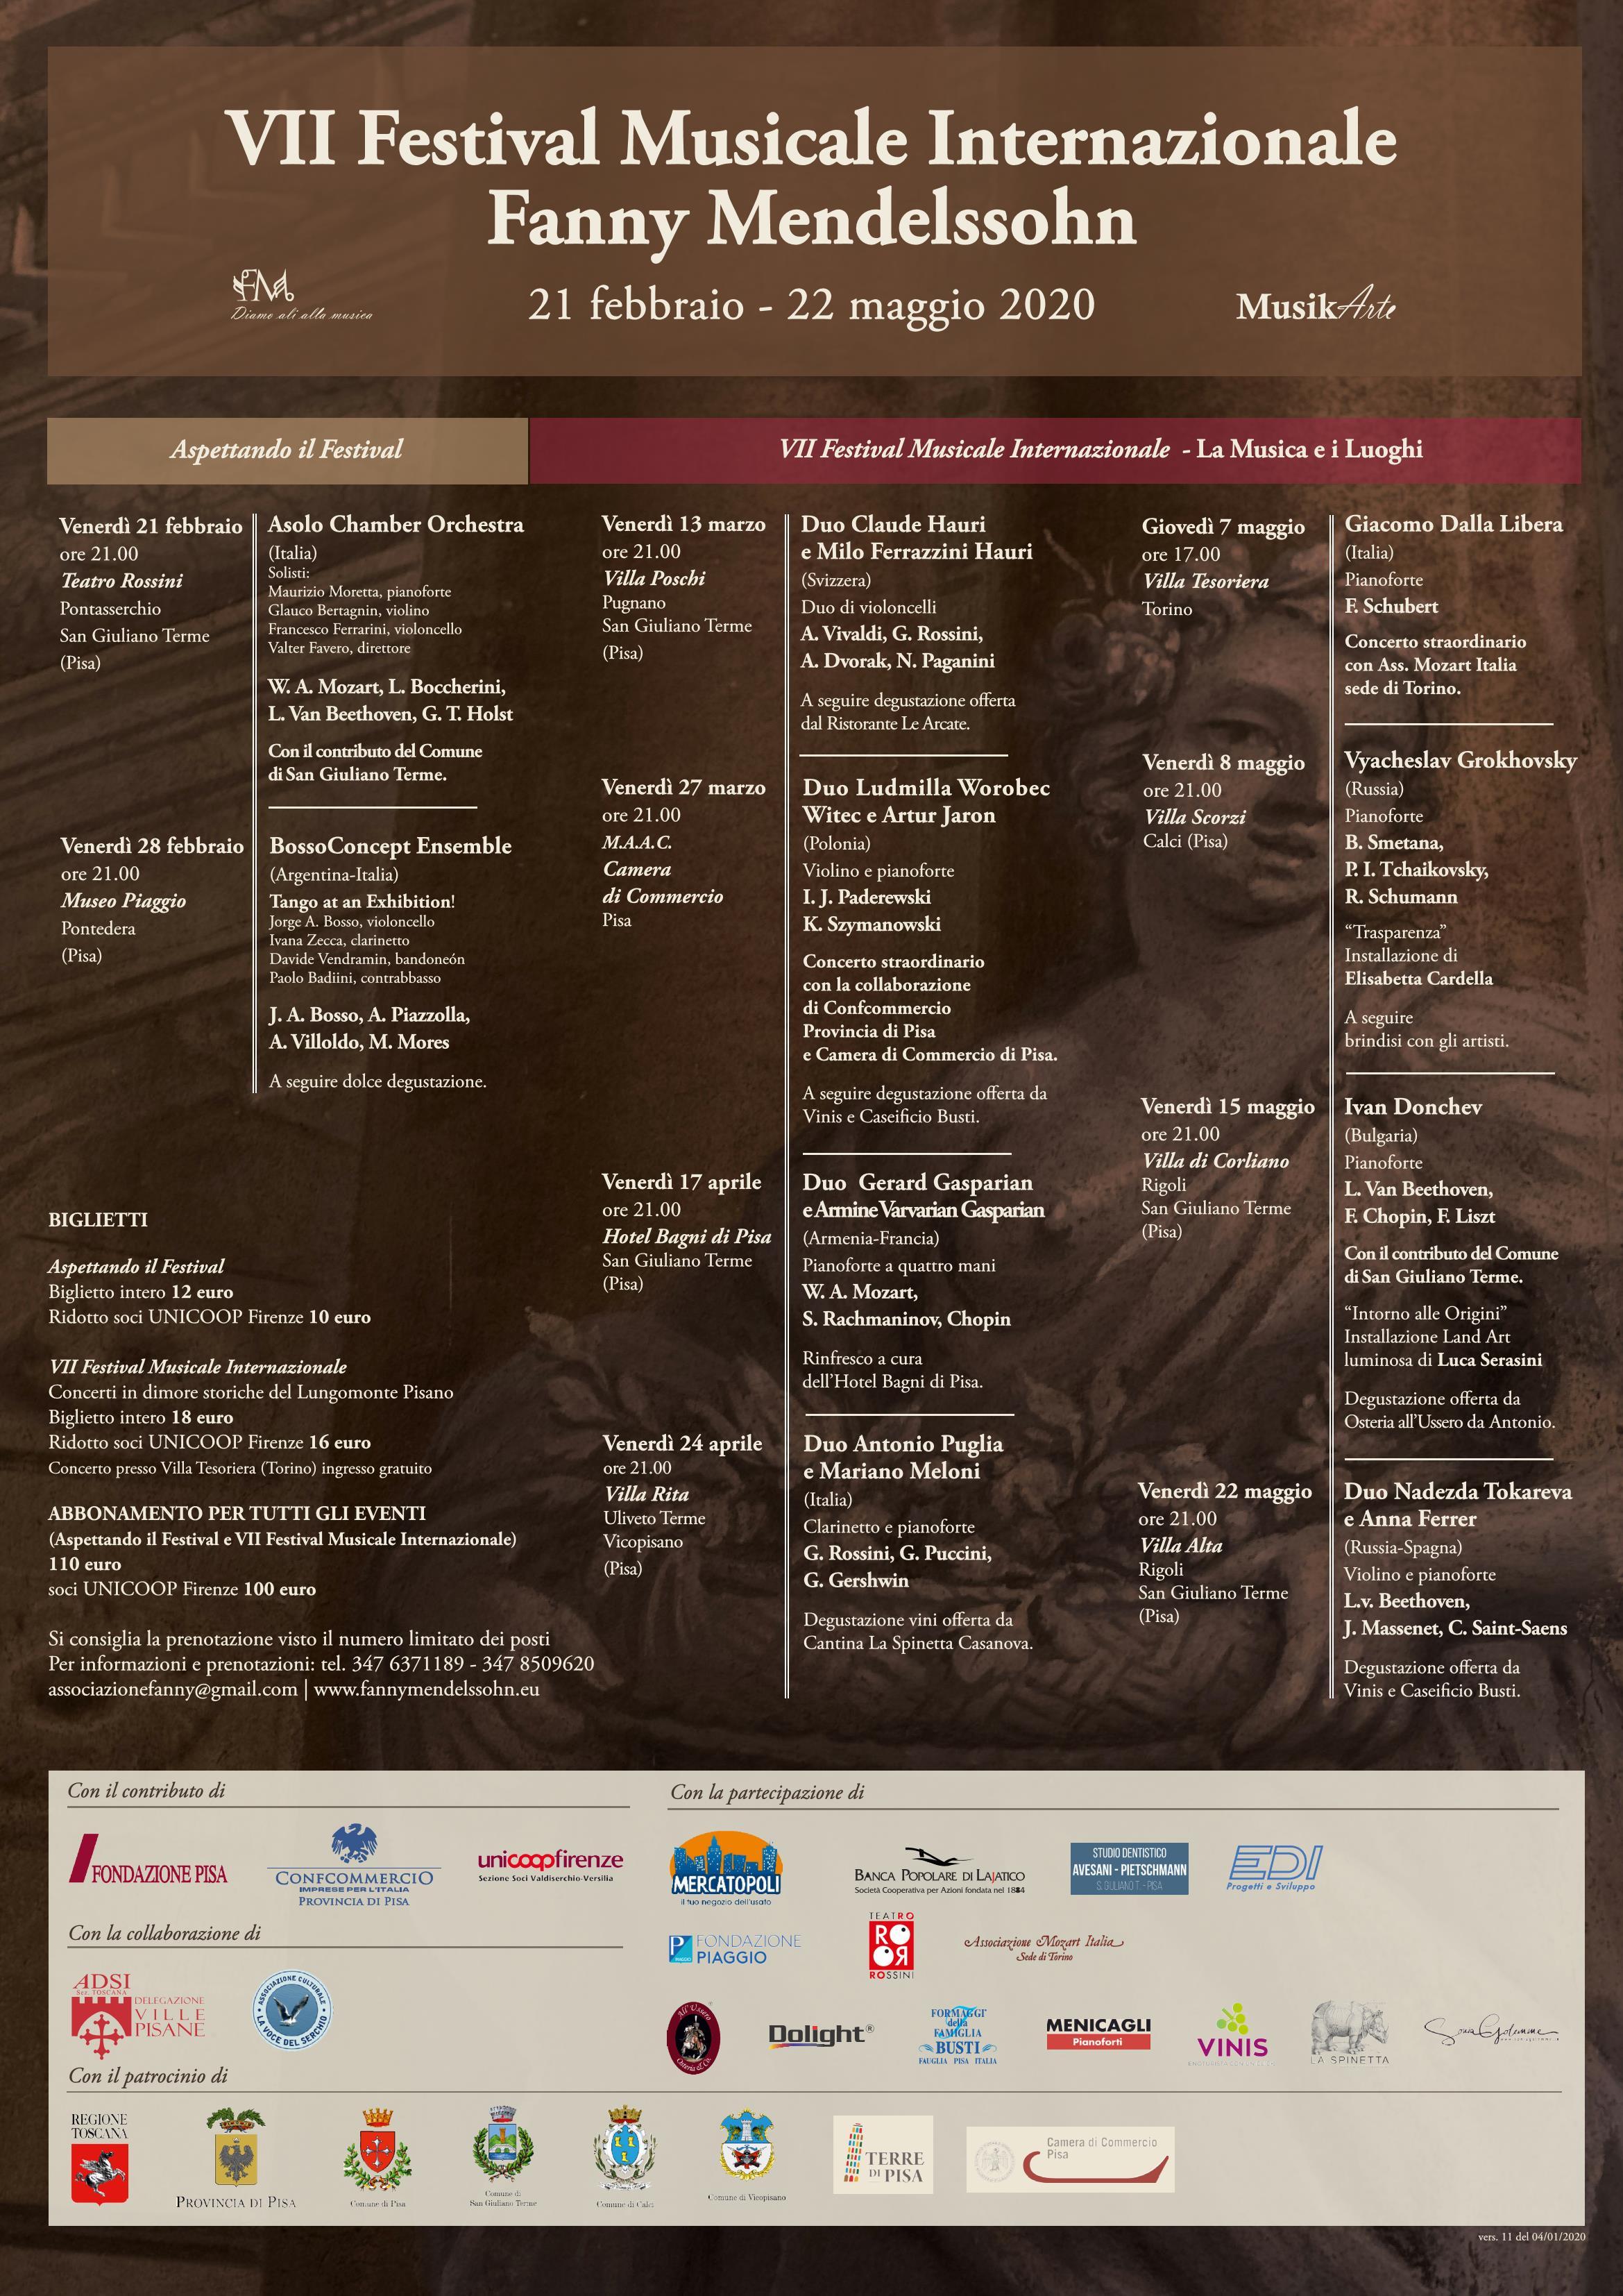 7° Festival Internazionale Musikarte Fanny Mendelssohn